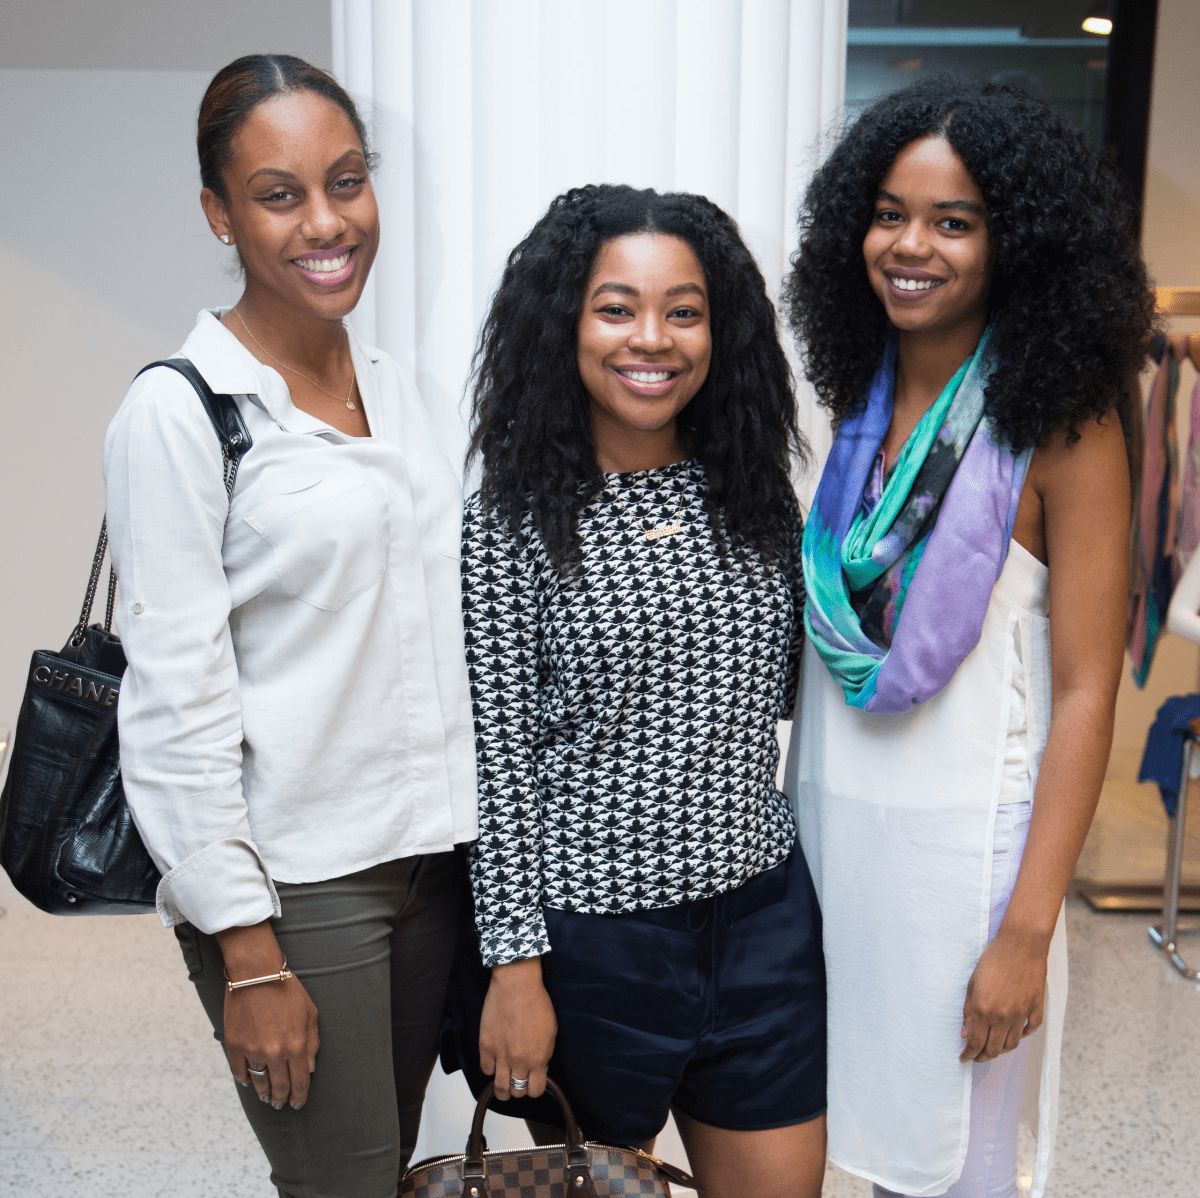 News, Shelby, Ovarian Cancer Awareness Month. tootsies, Sept. 2015, Kara Smith, Gabrielle Sauls, Jailyn Marcel.